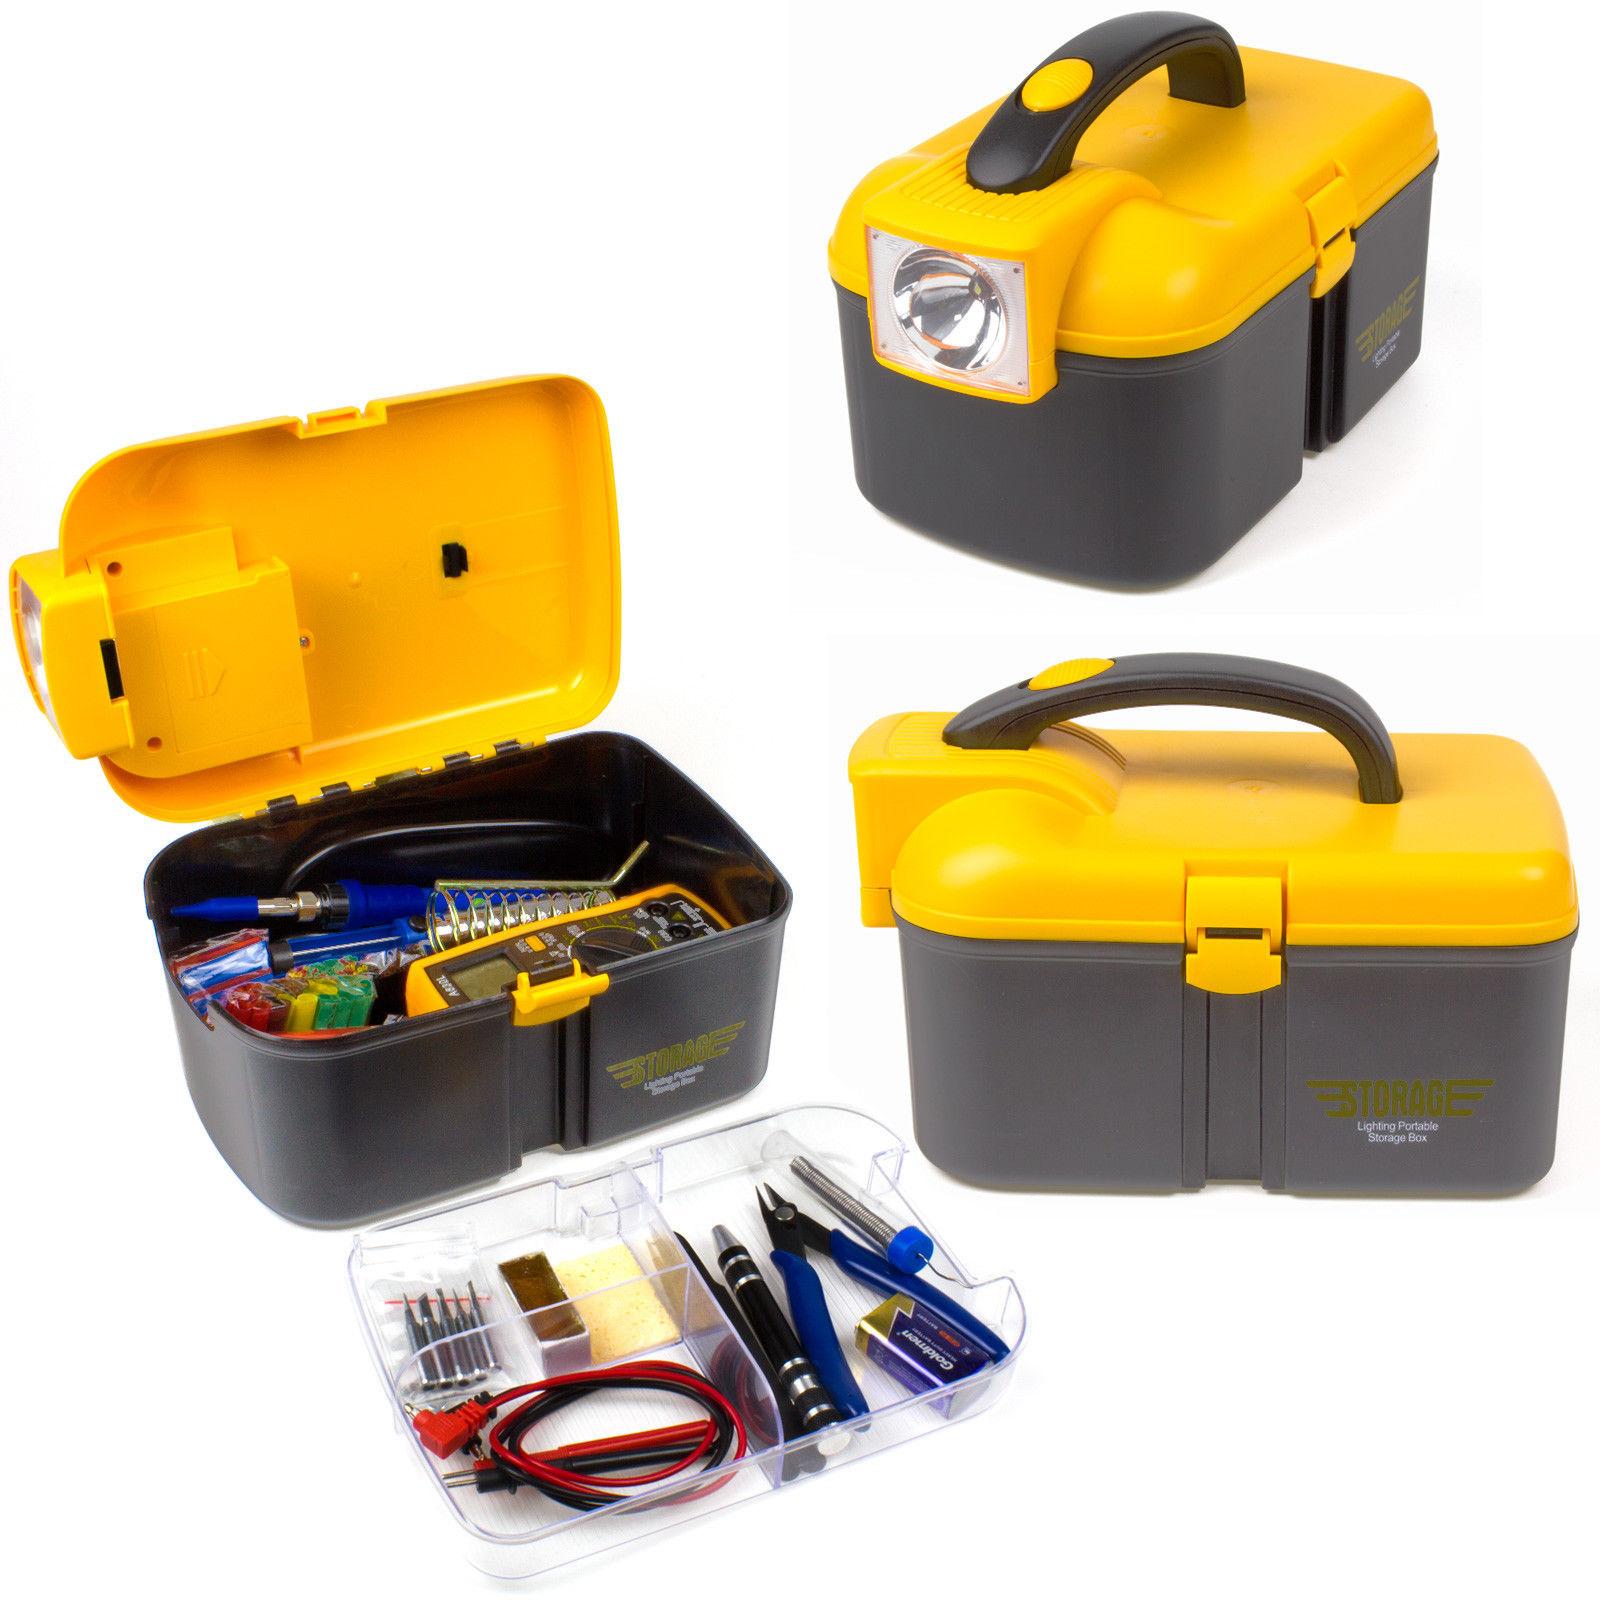 Soldering Iron Kit Welding Tool 60W Adjustable Temp Digital Multimeter with Box